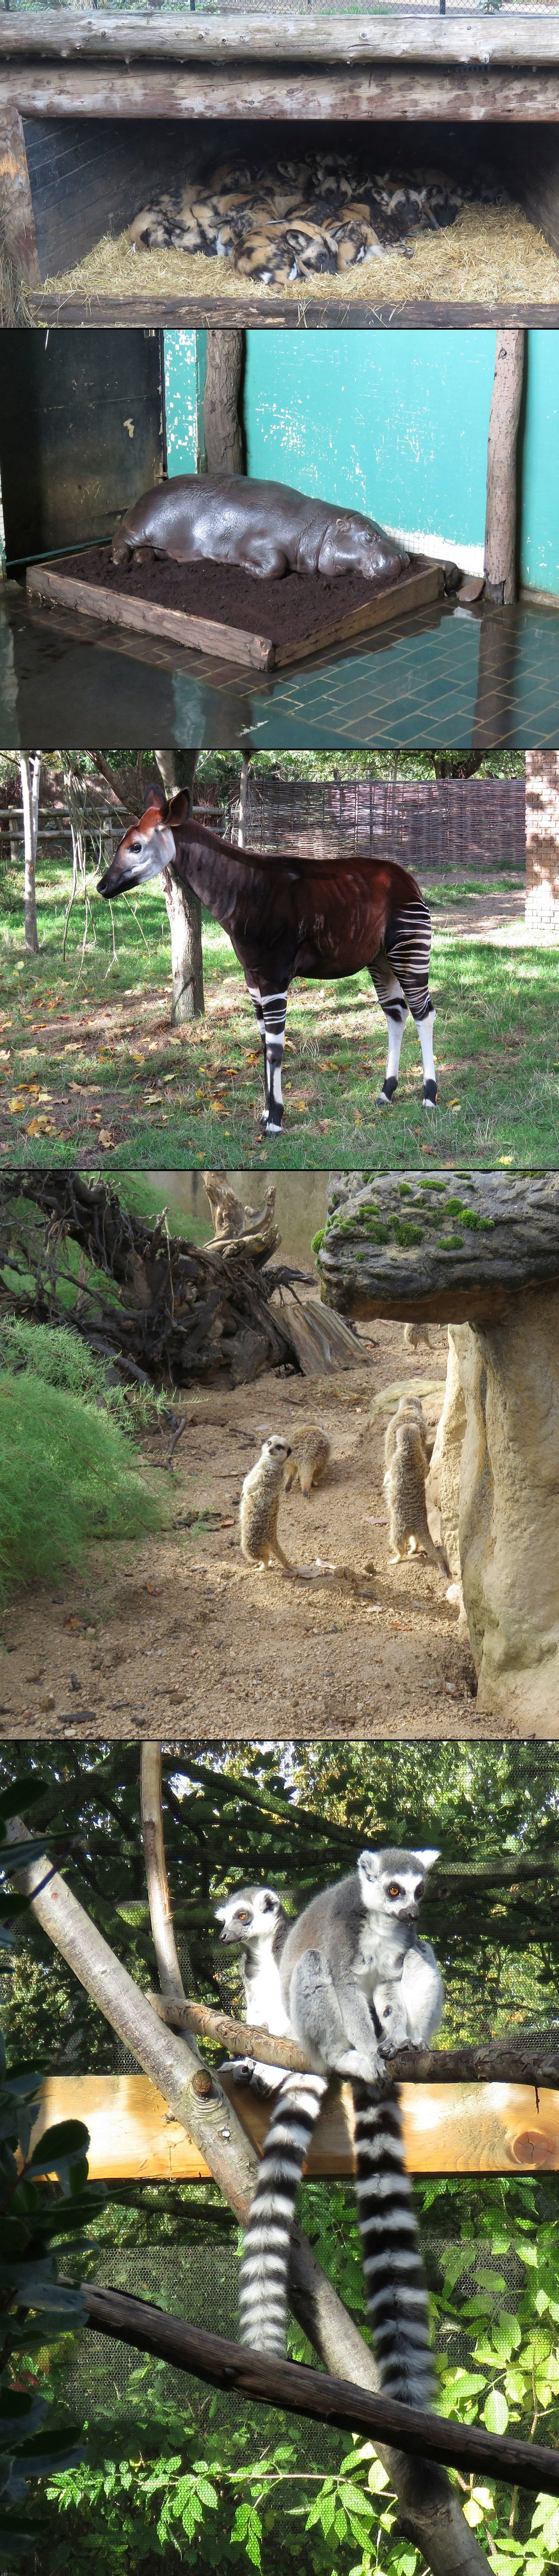 African wild dogs, pigmy hippo, okapi, meerkats, ring tailed lemurs